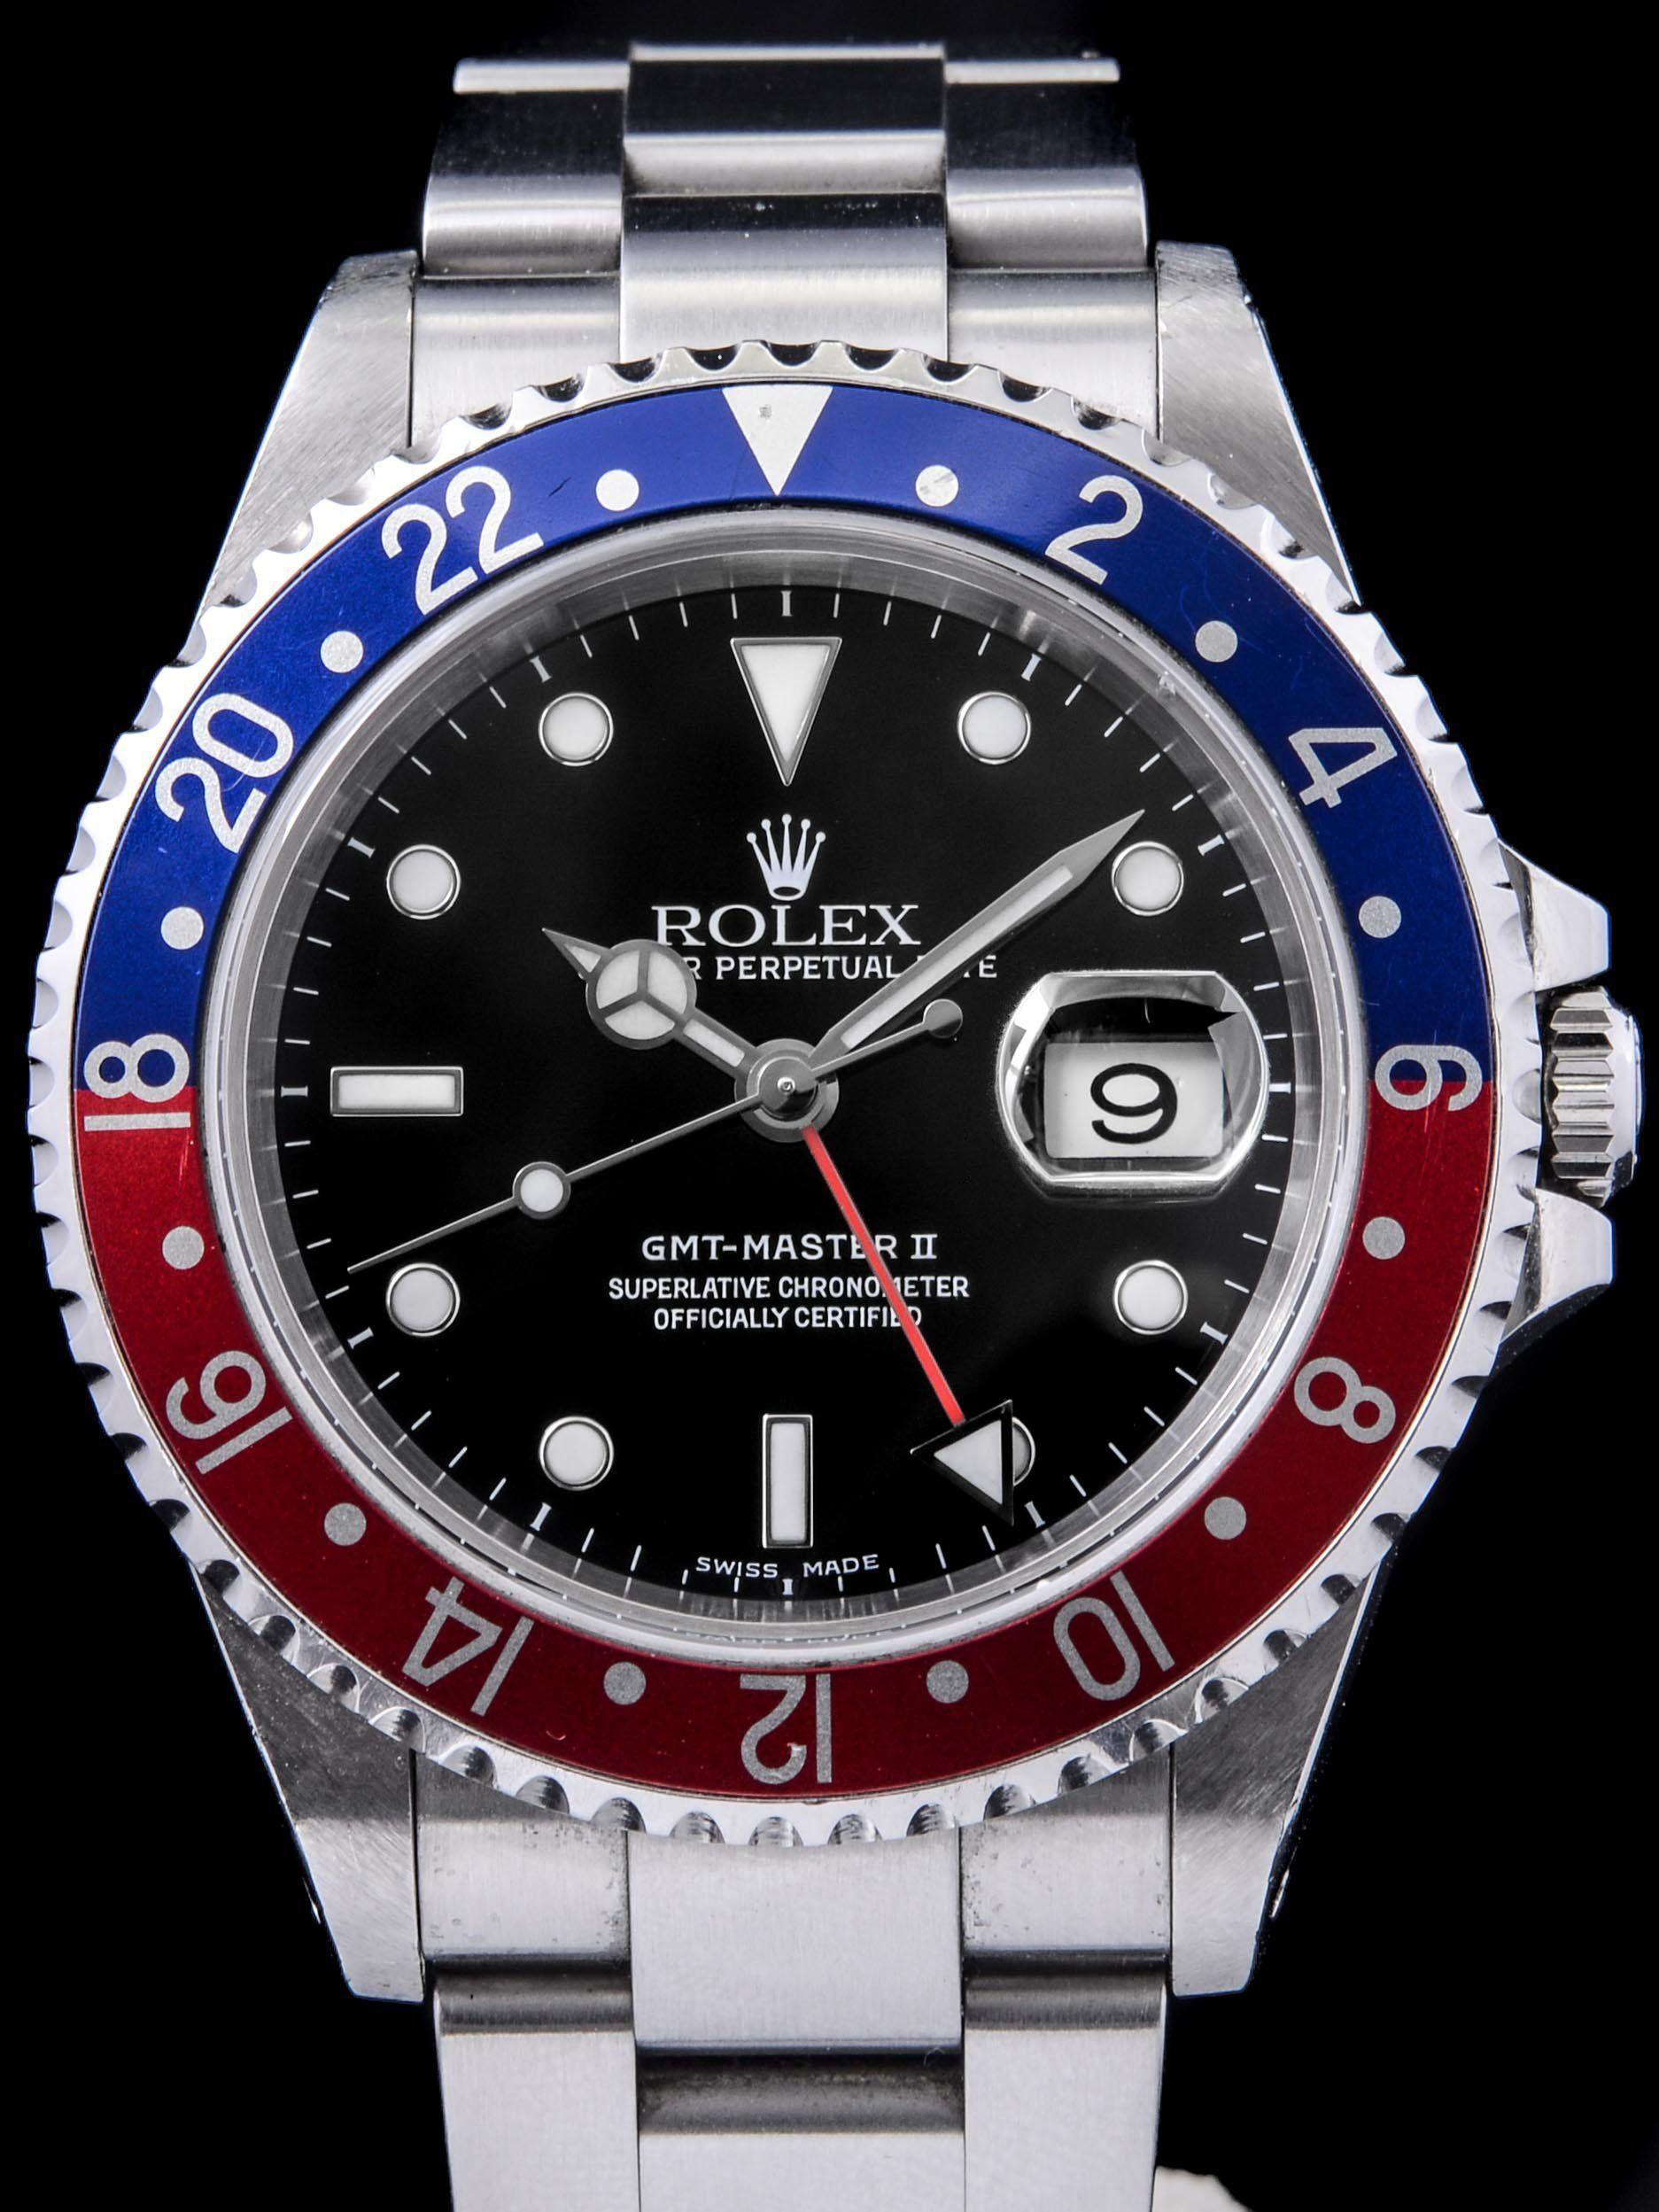 2002 Rolex Gmt Master Ii Ref 16710 Rolex Gmt Master Ii Rolex Gmt Master Rolex Gmt